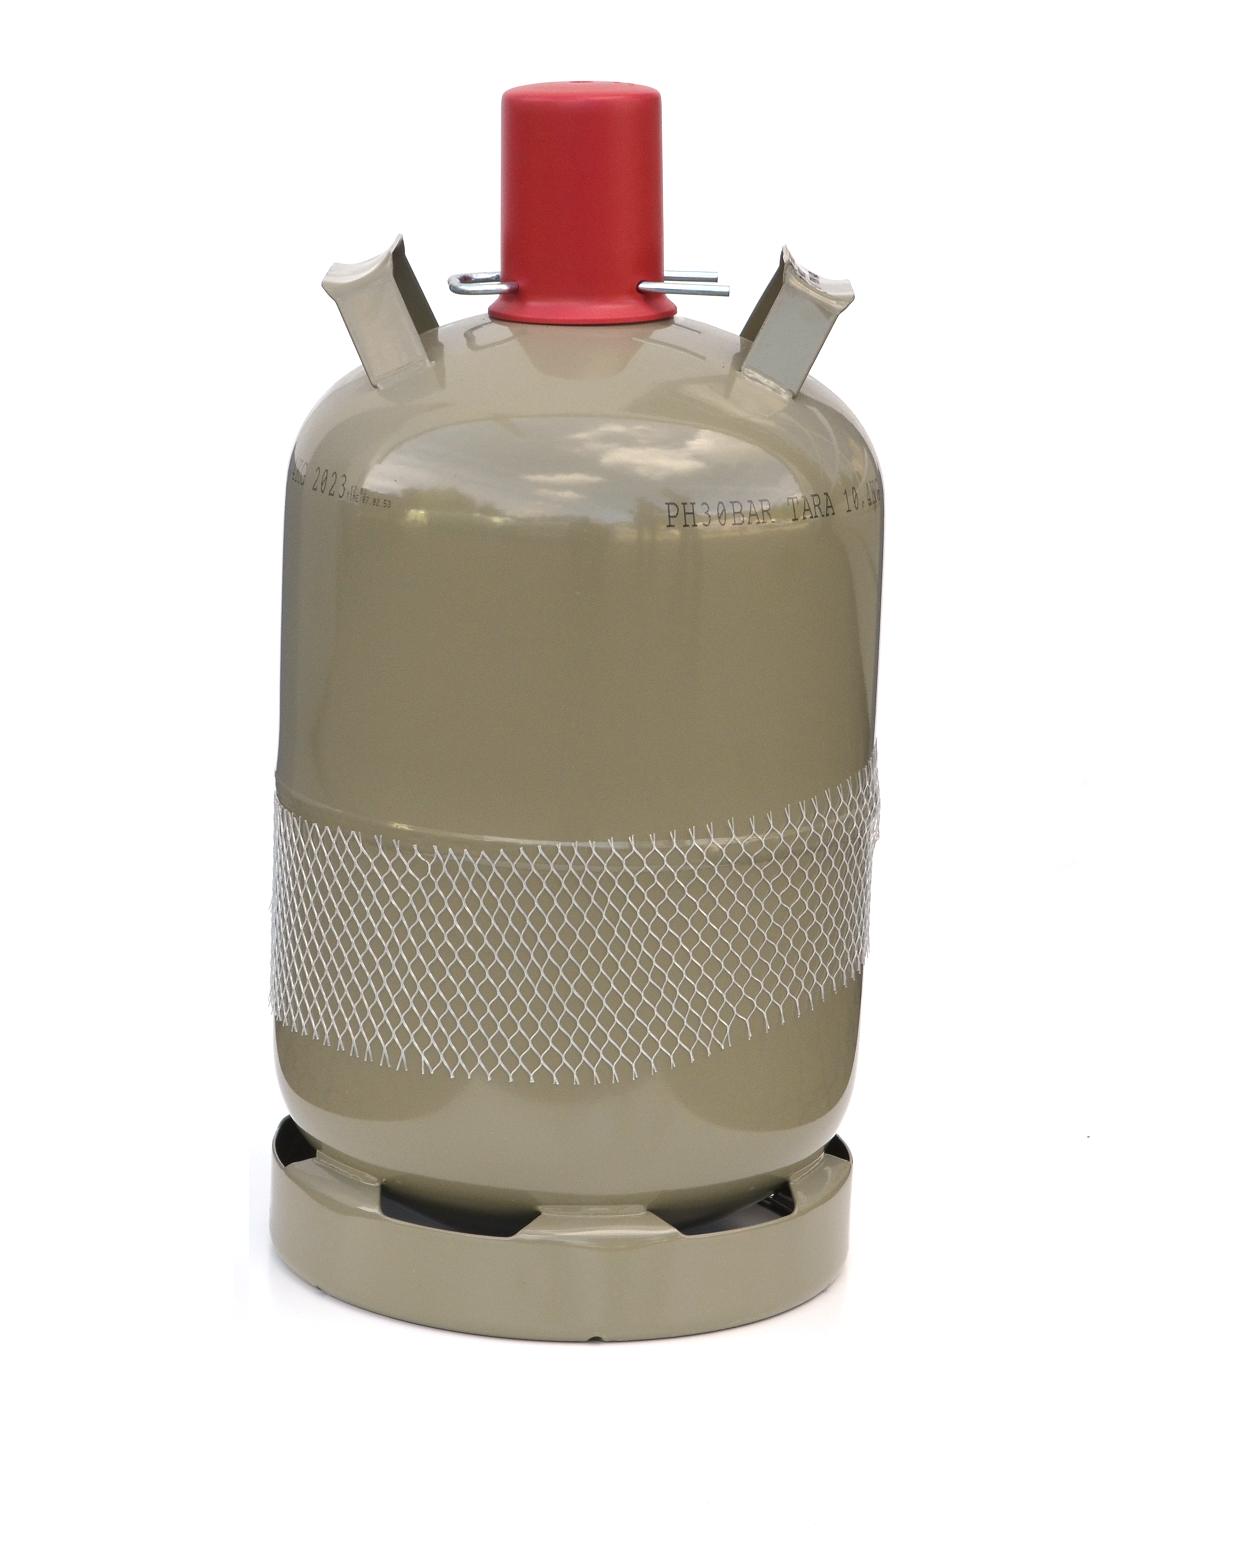 11 kg propangasflasche neu. Black Bedroom Furniture Sets. Home Design Ideas